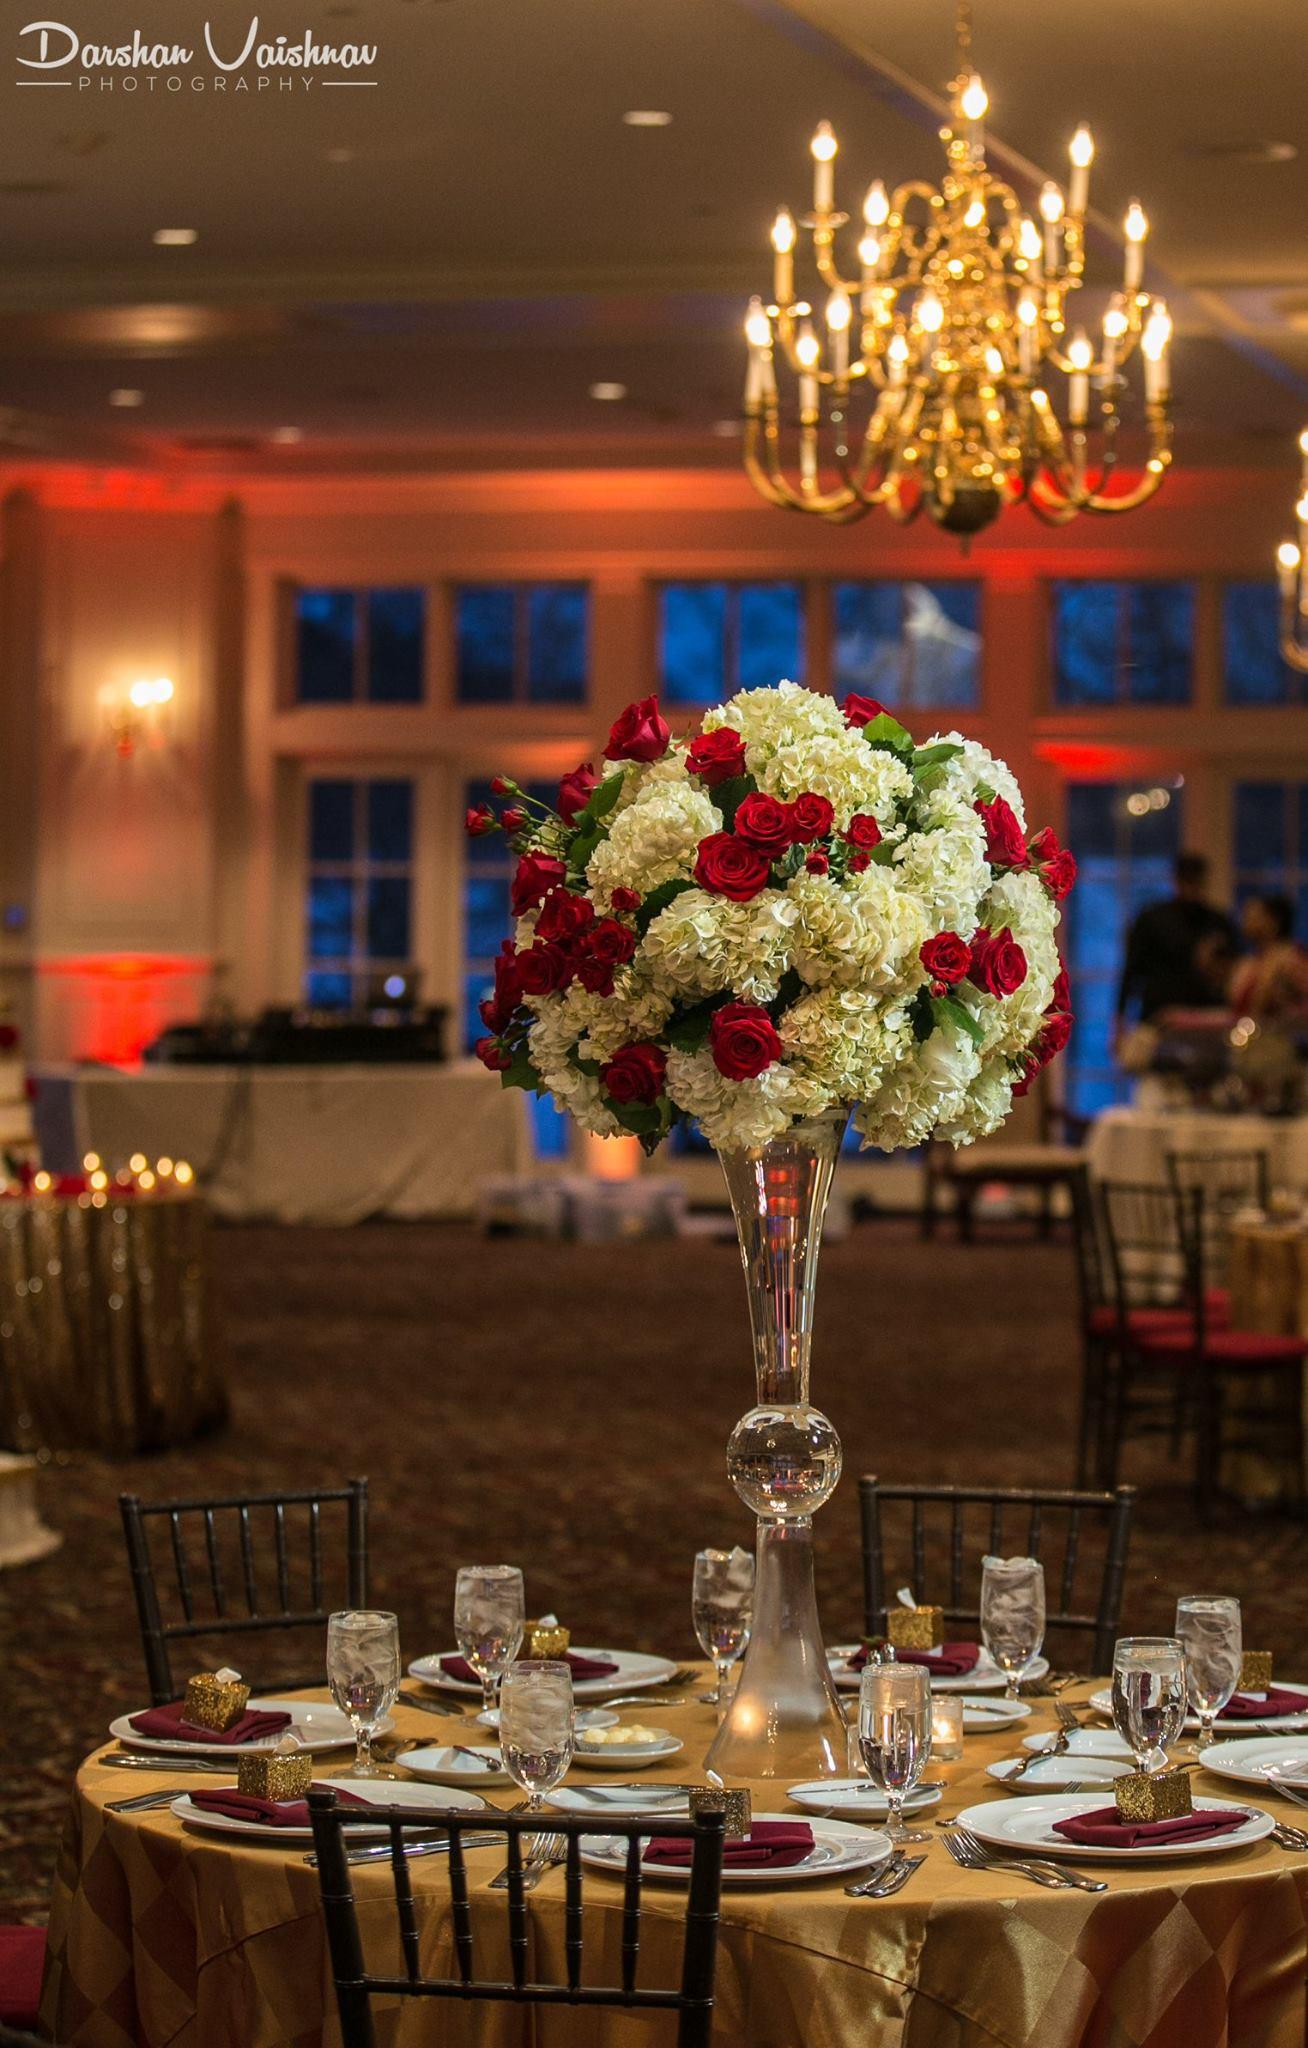 ImperialDecor - Thematic Wedding Decor